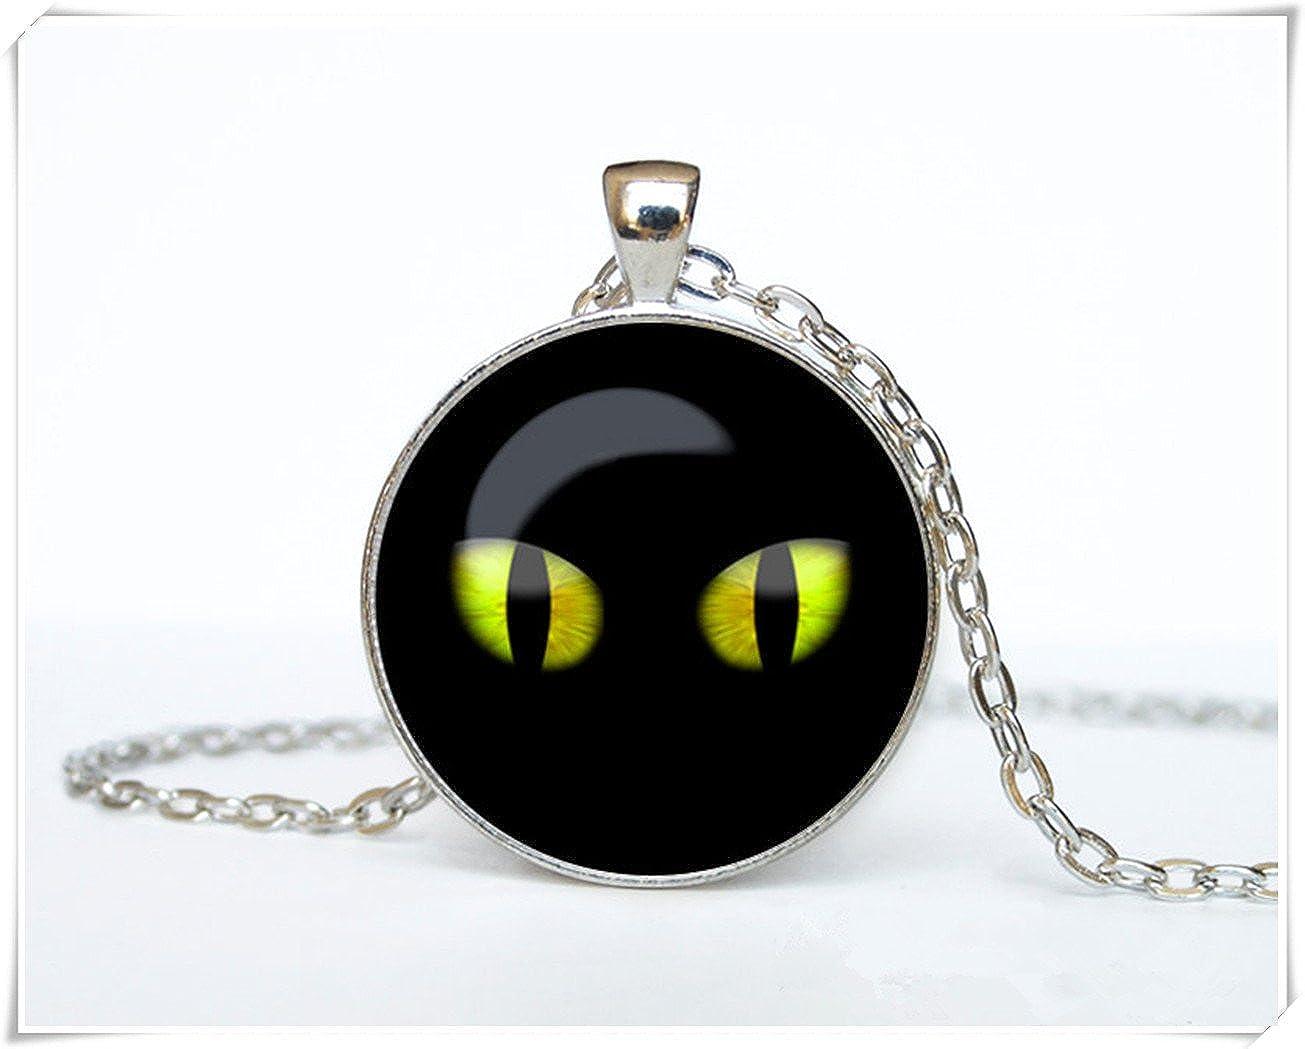 Black cat Pendant Black cat necklace Black cat jewelry Halloween necklace cq2